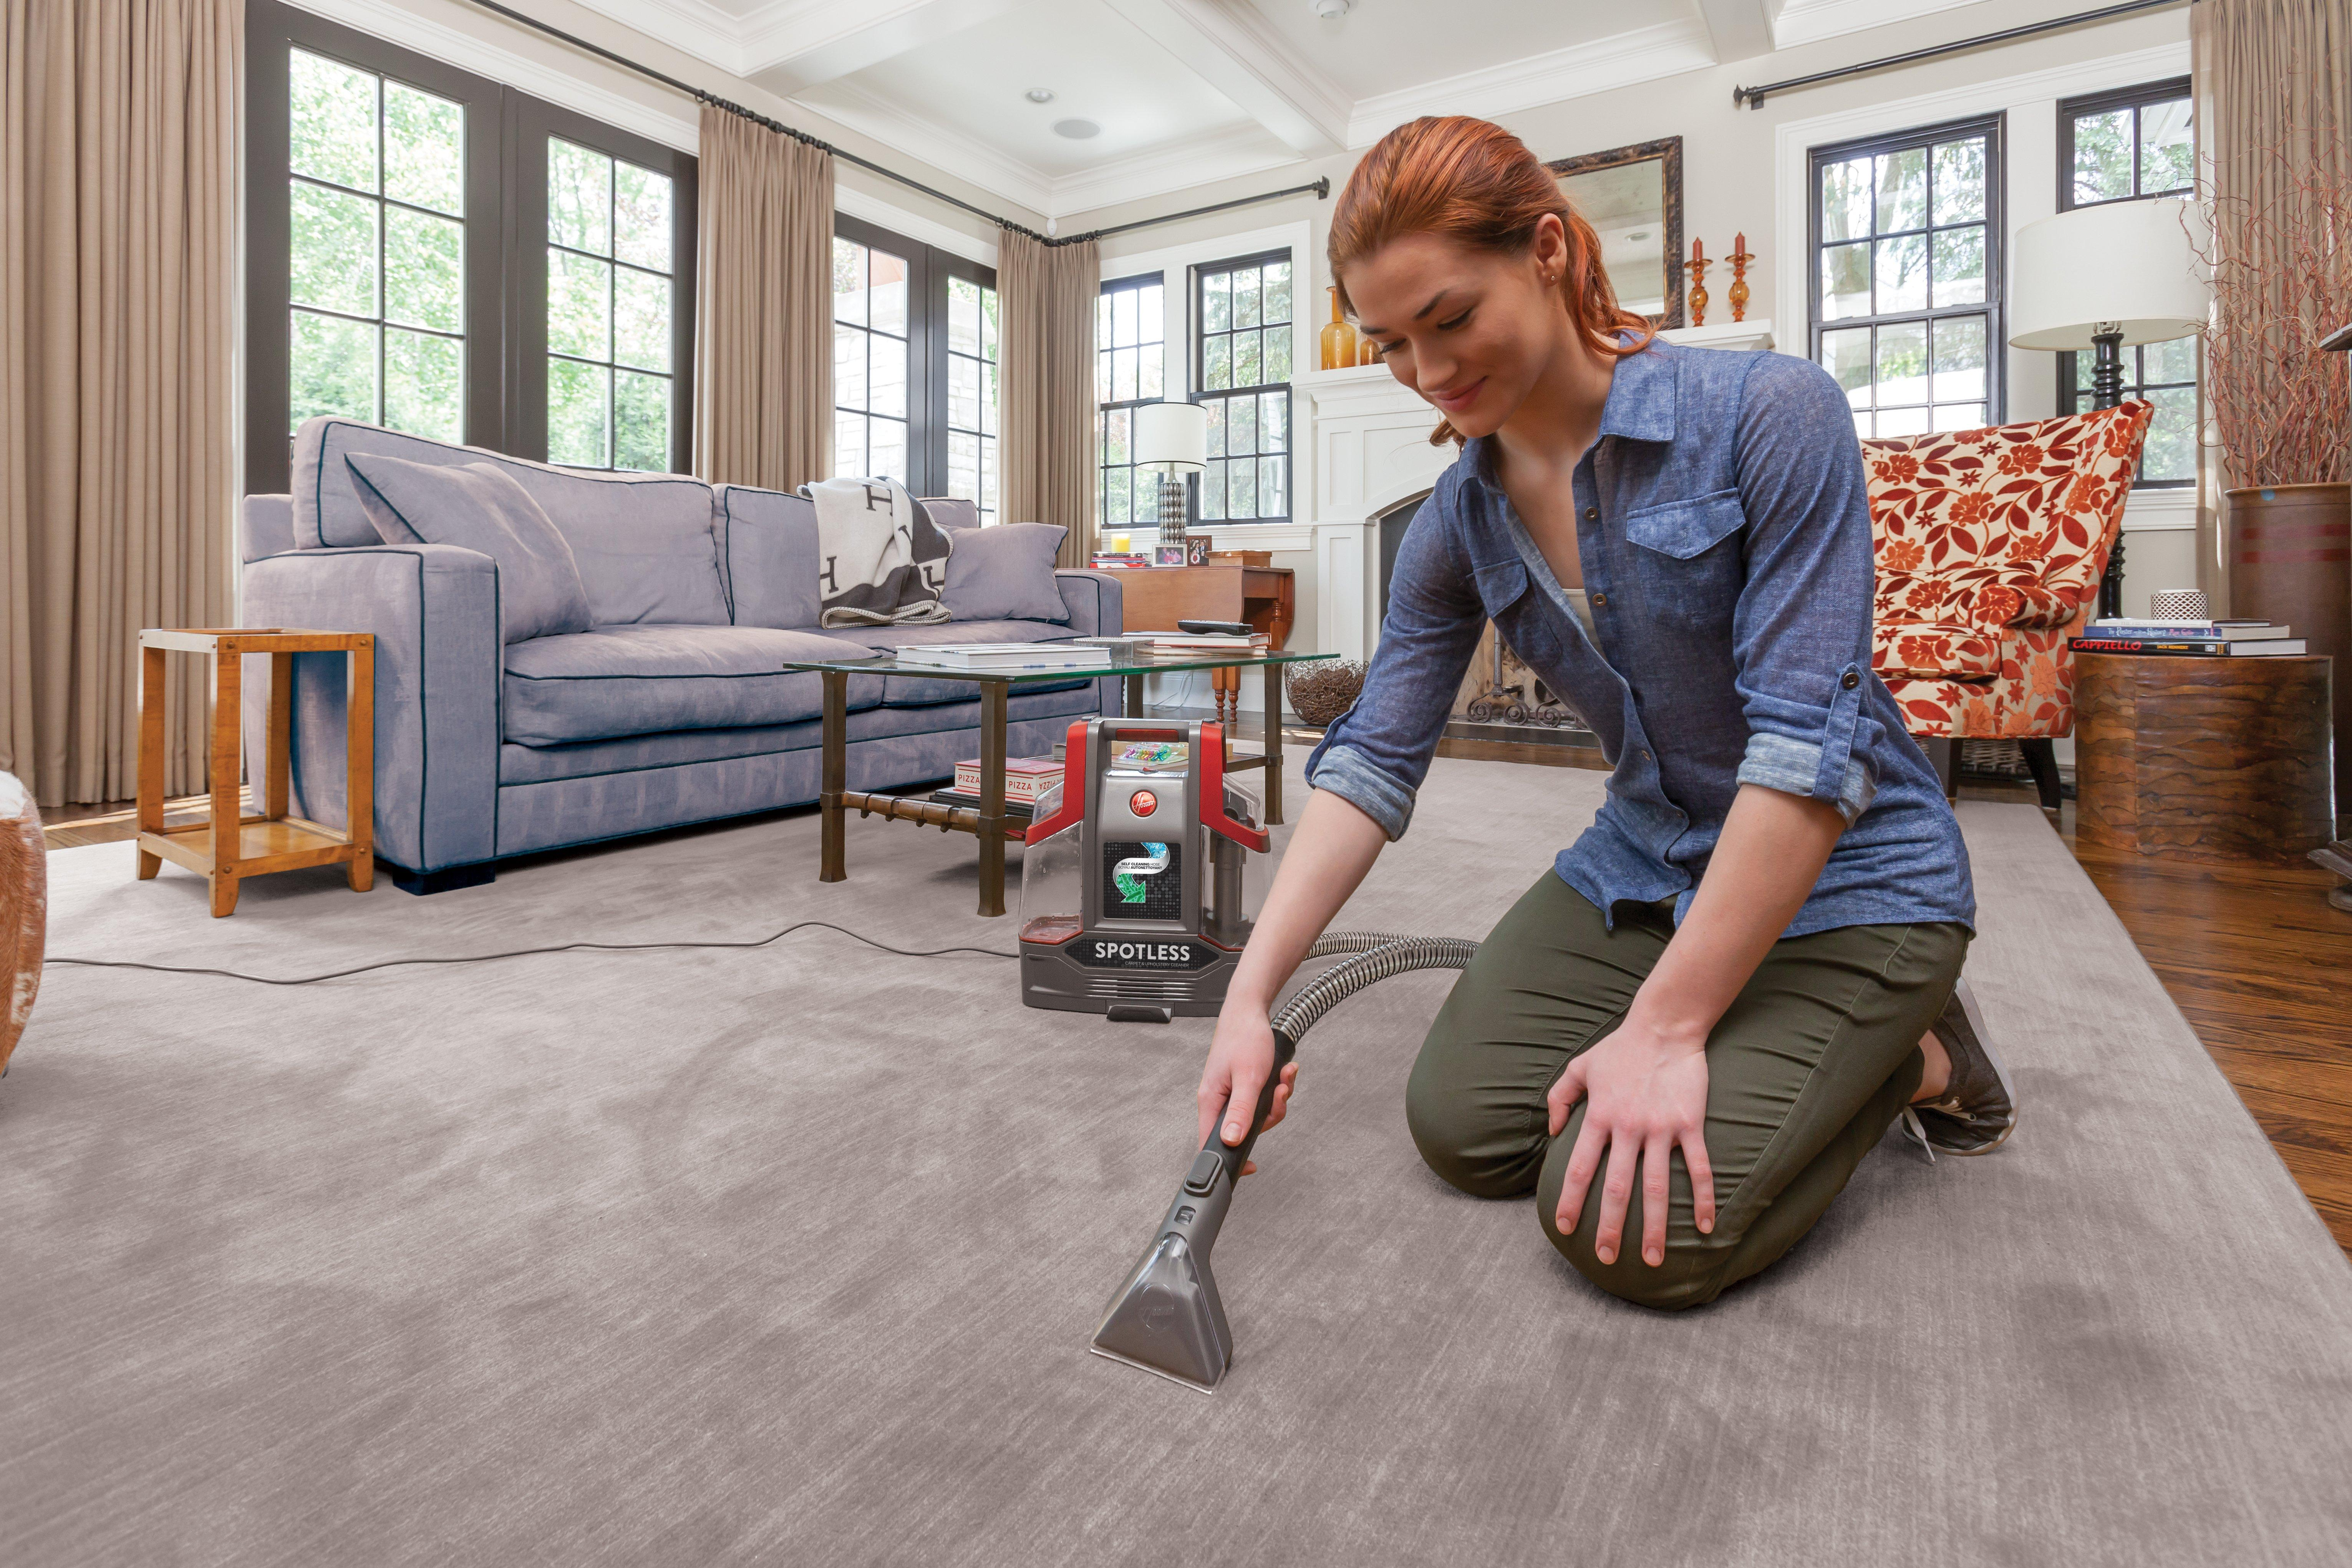 Spotless Pet Portable Carpet & Upholstery Cleaner2